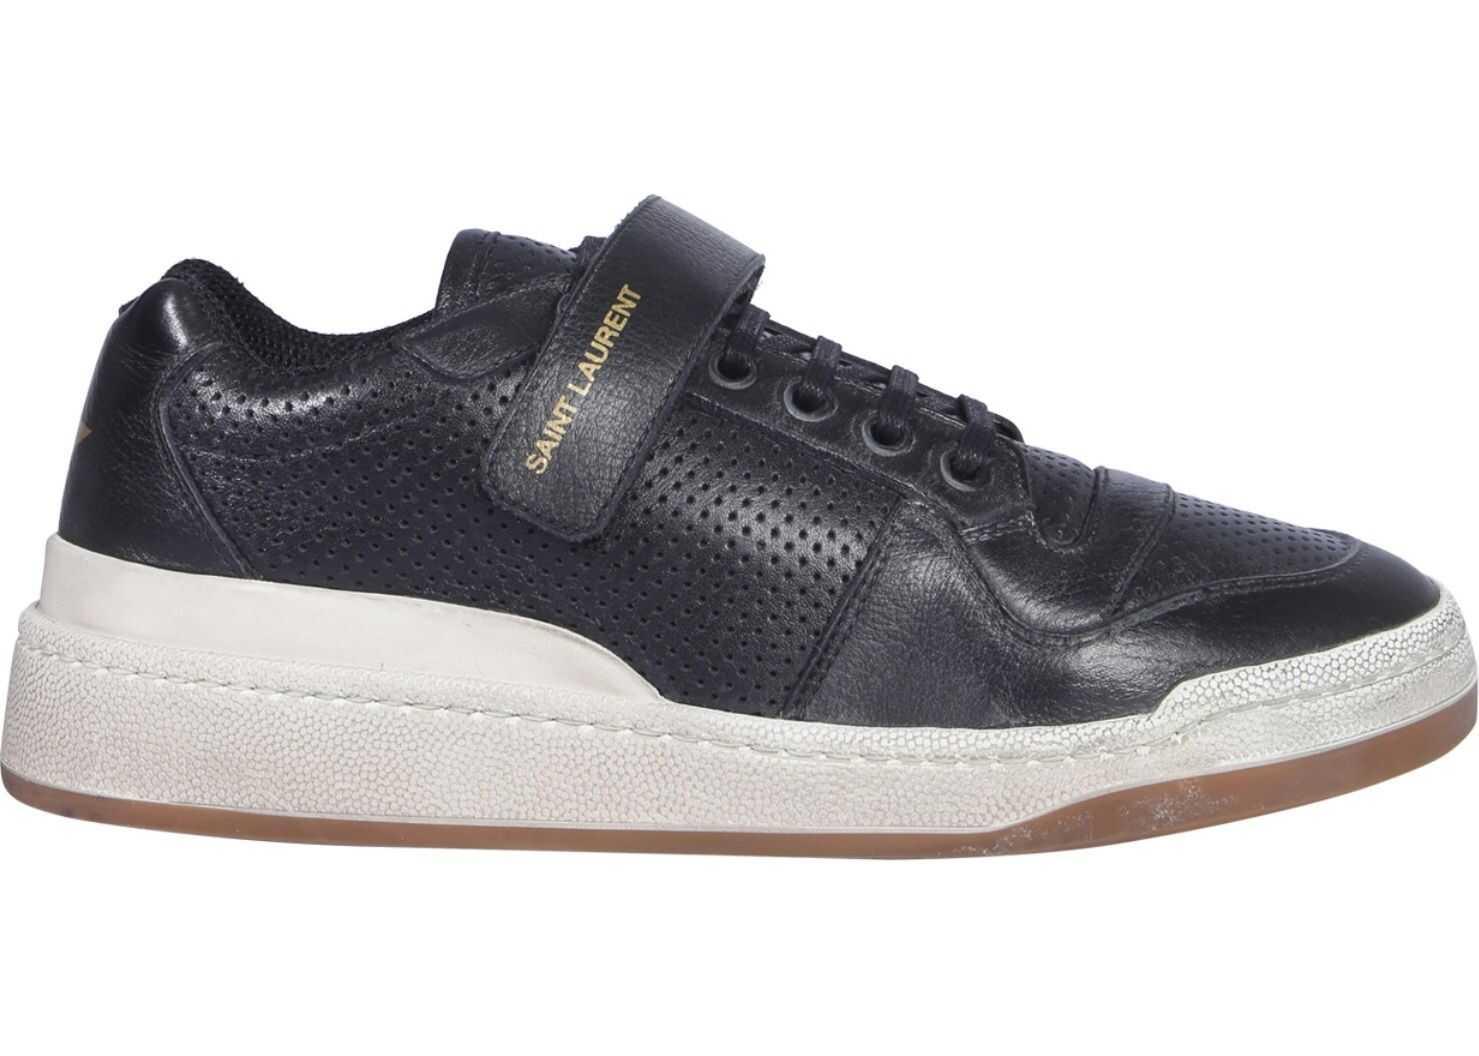 Saint Laurent Low Top Age Sneakers BLACK